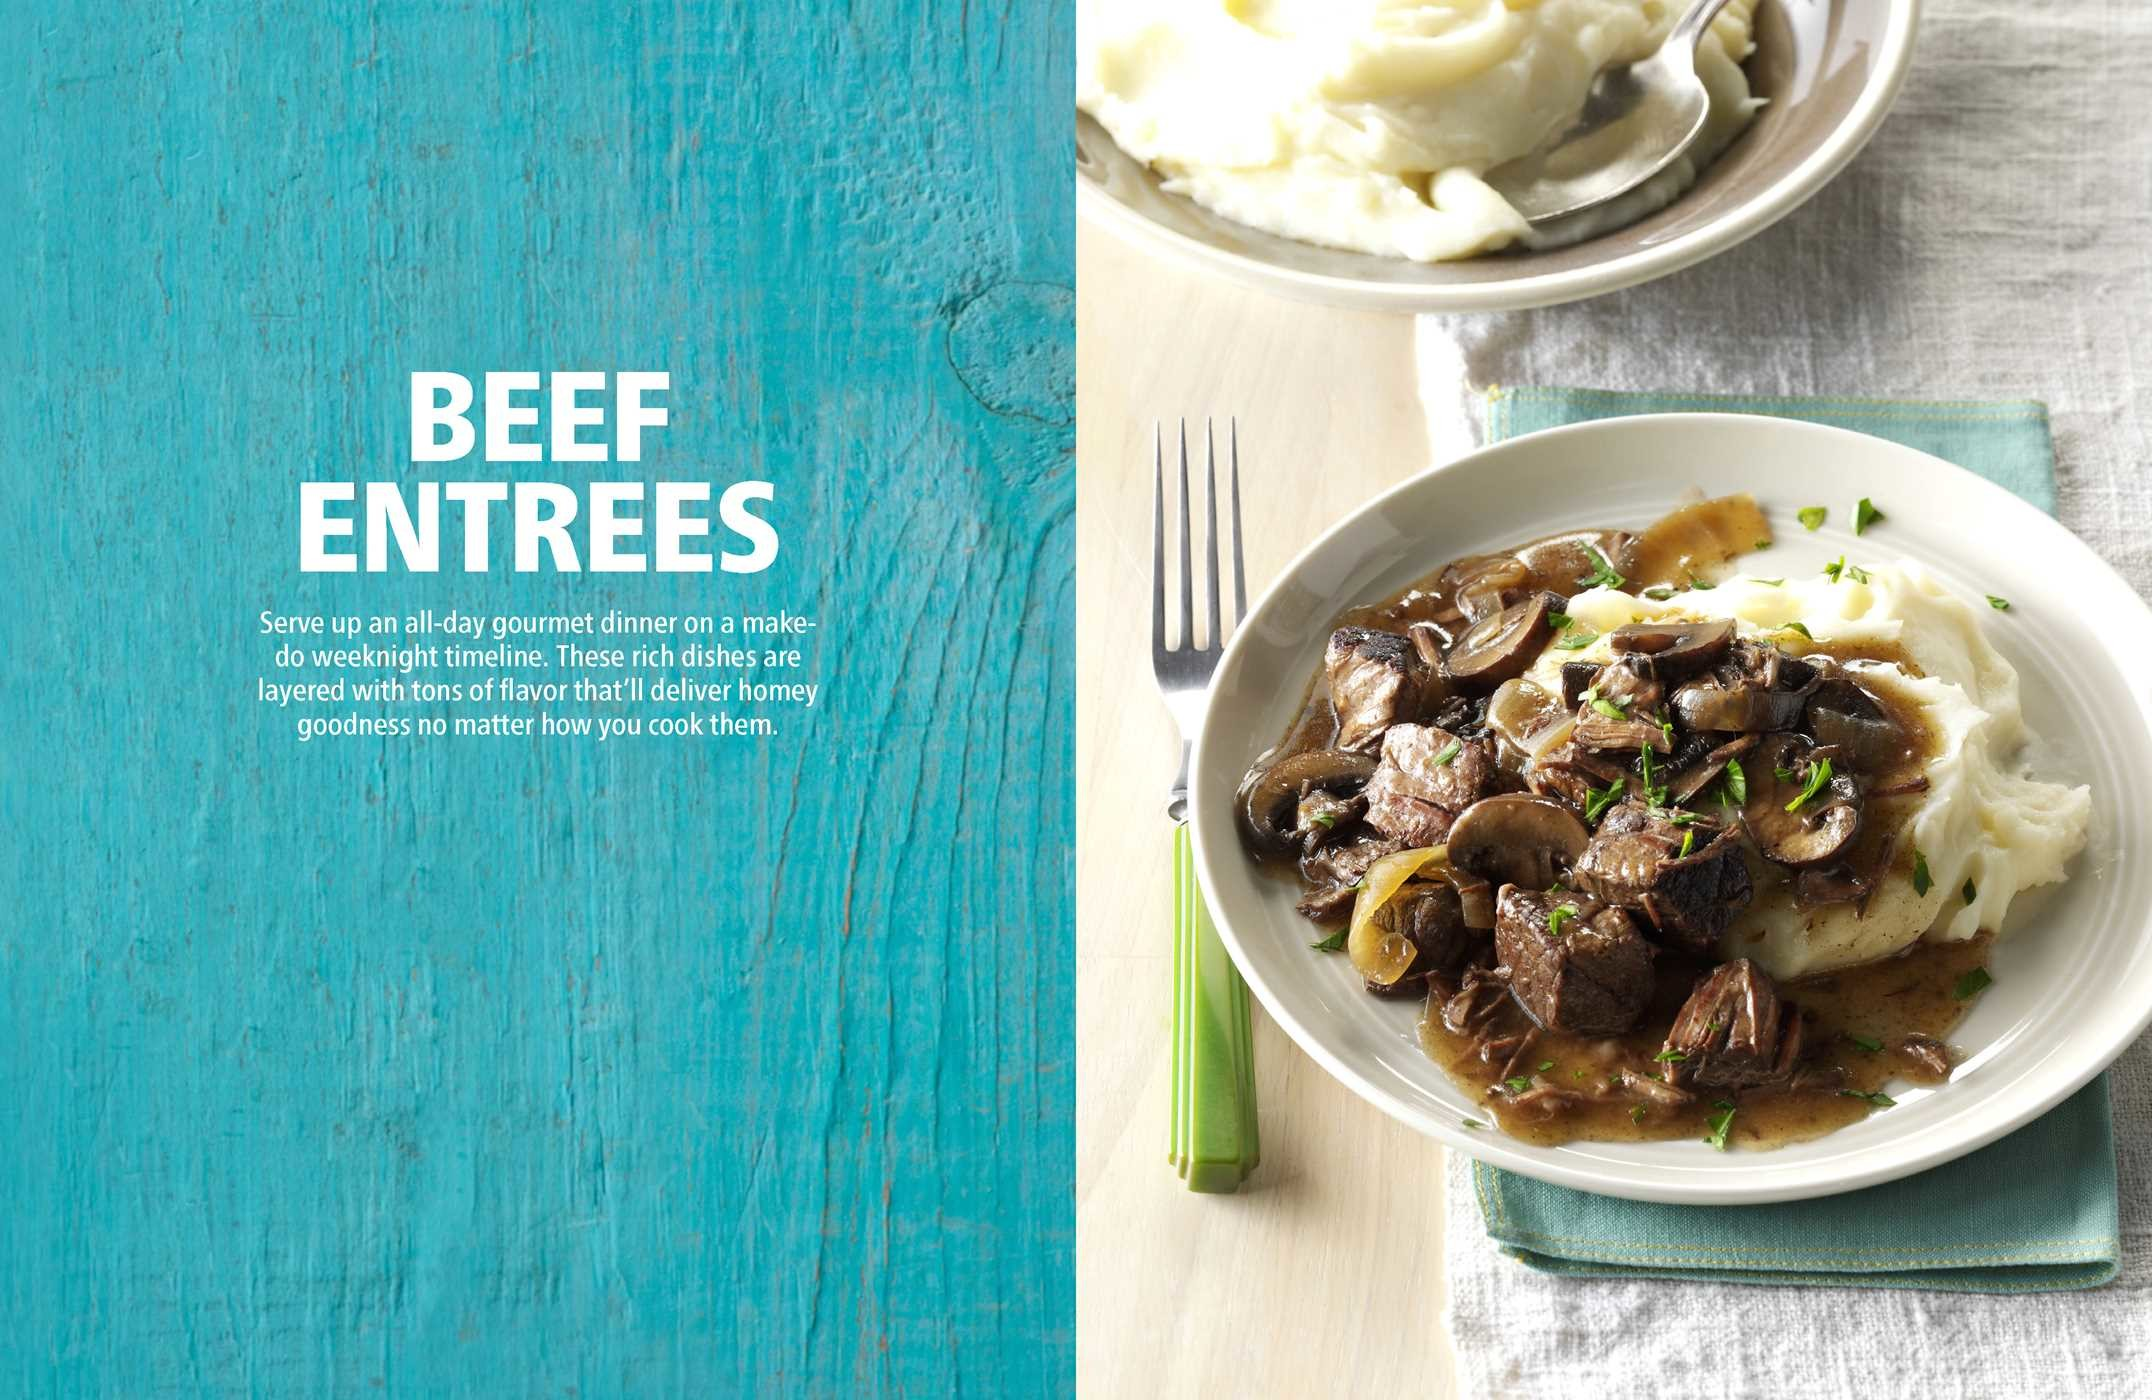 Taste of home instant pot cookbook 9781617657665.in01